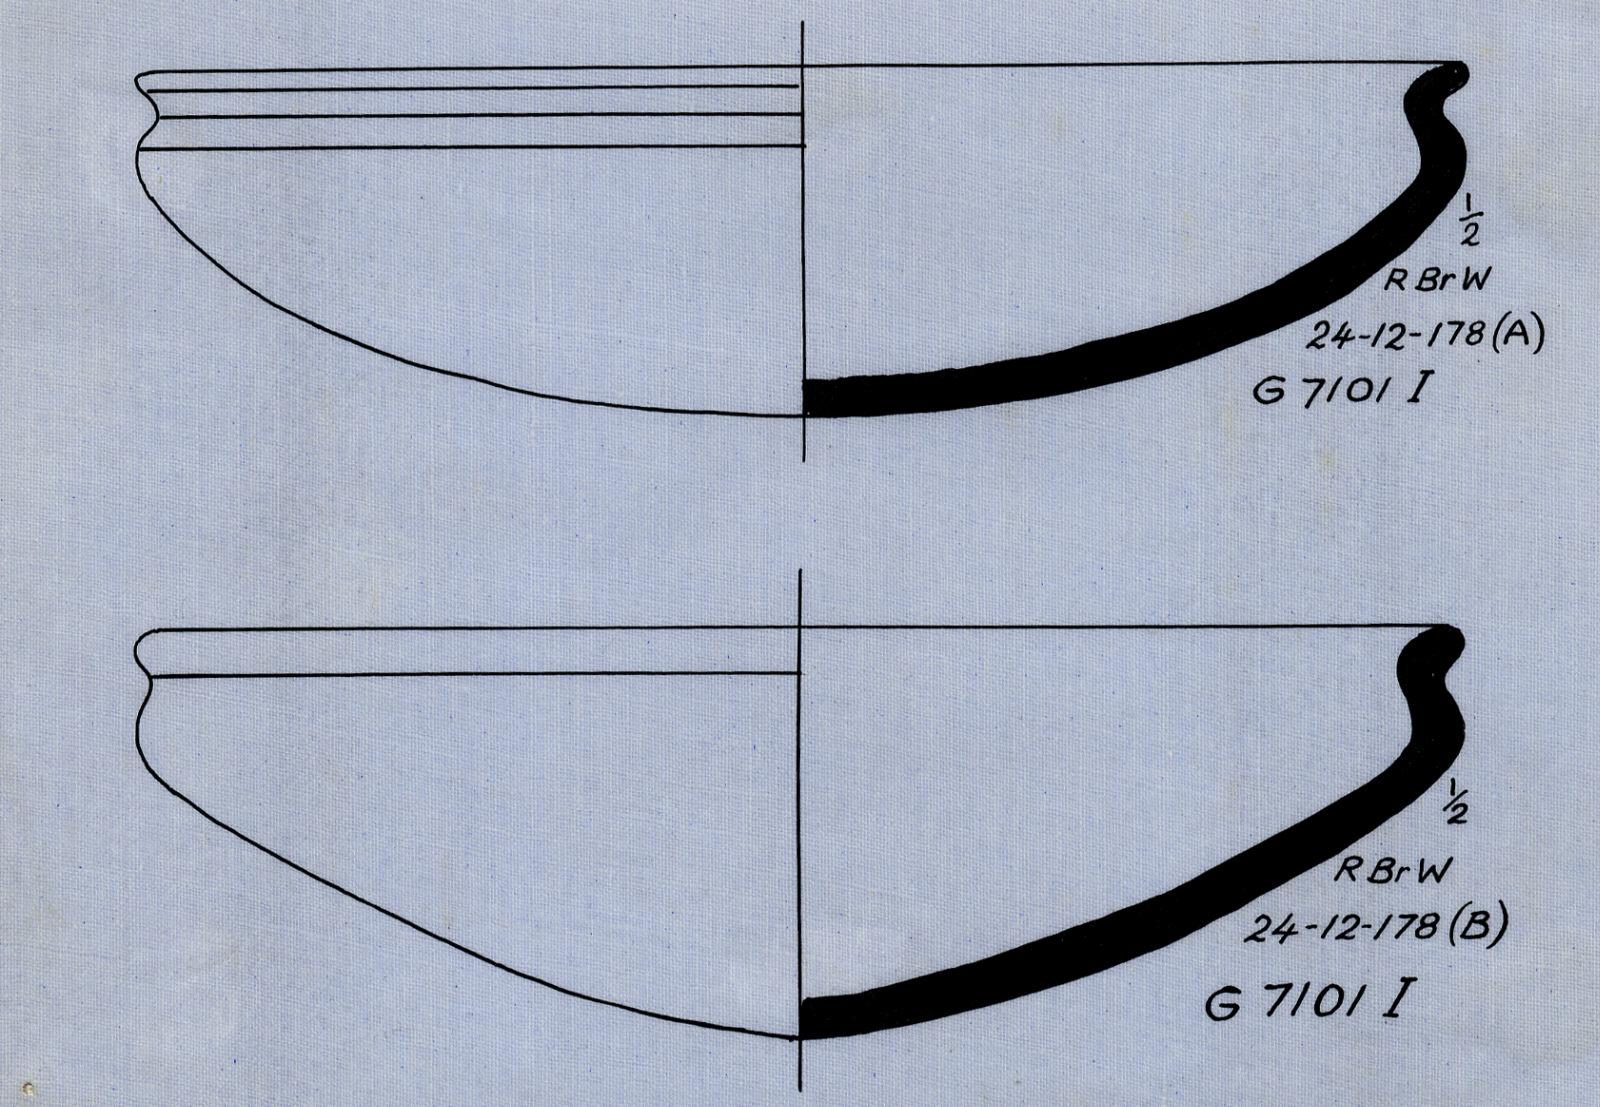 Drawings: G 7101, Shaft I: pottery, bowls